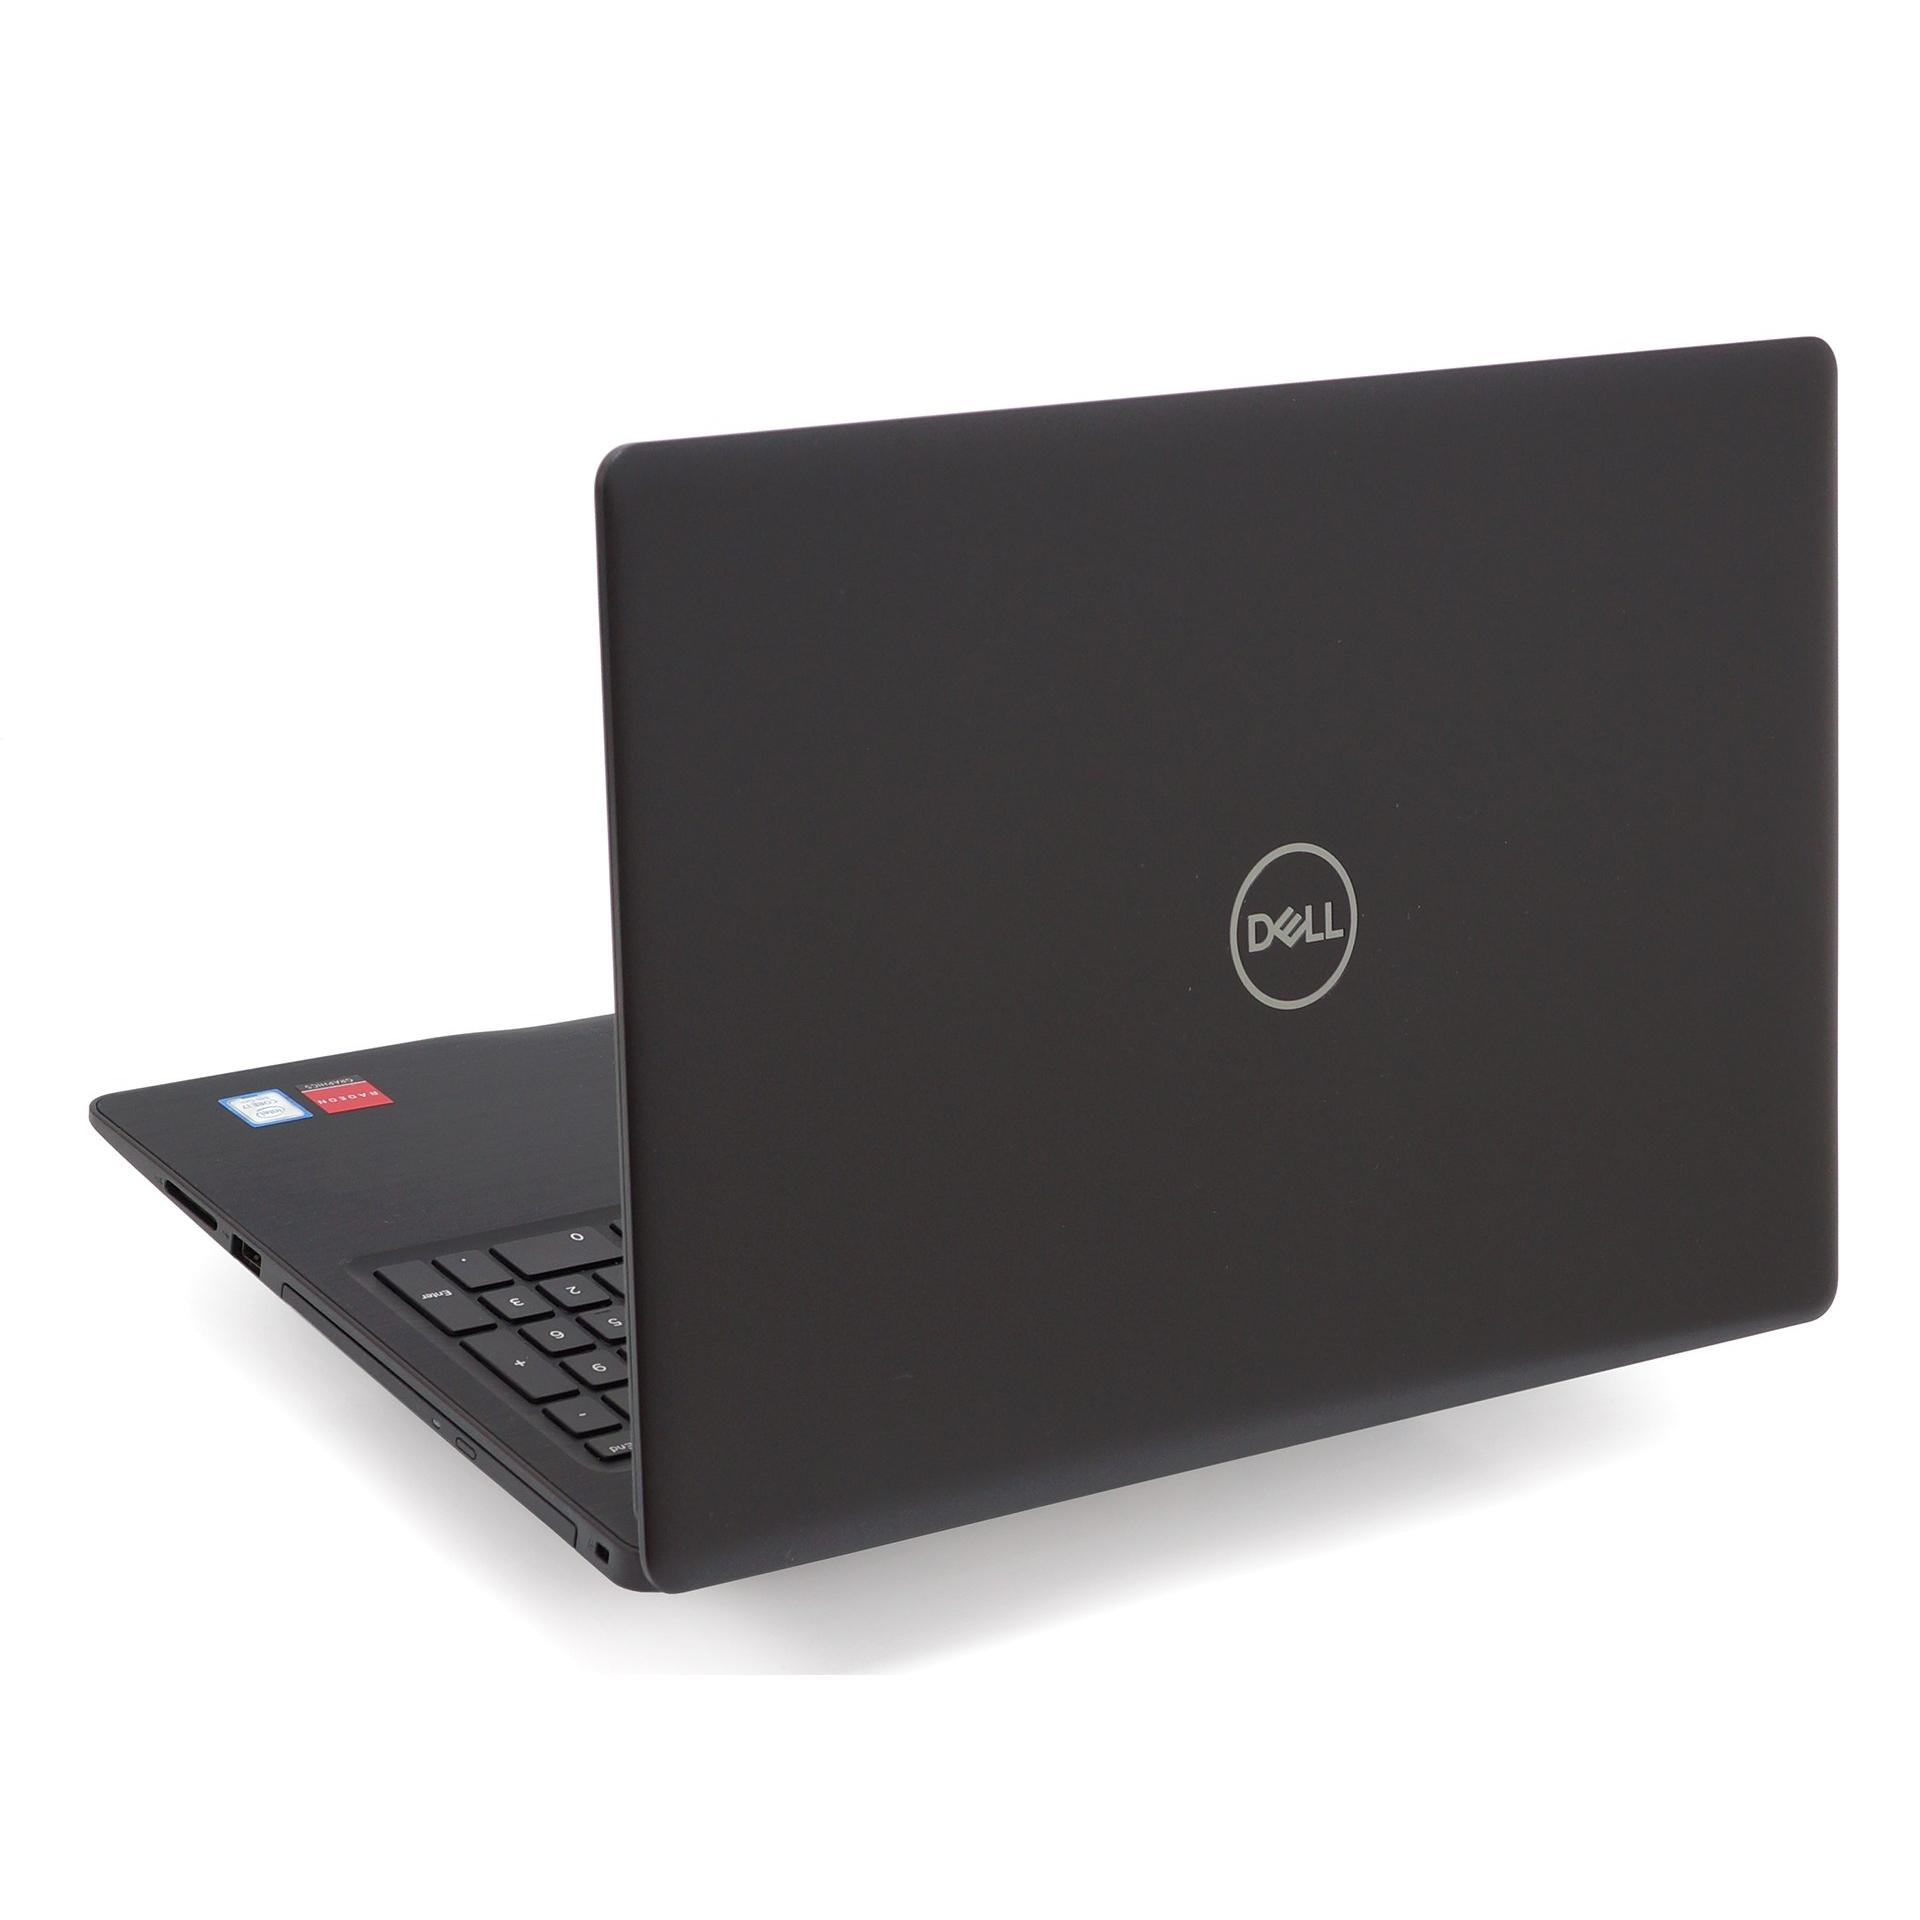 Dell 5570 15.6-inch (2018) - Core i3-8130U - 12 GB  - HDD 1 TB